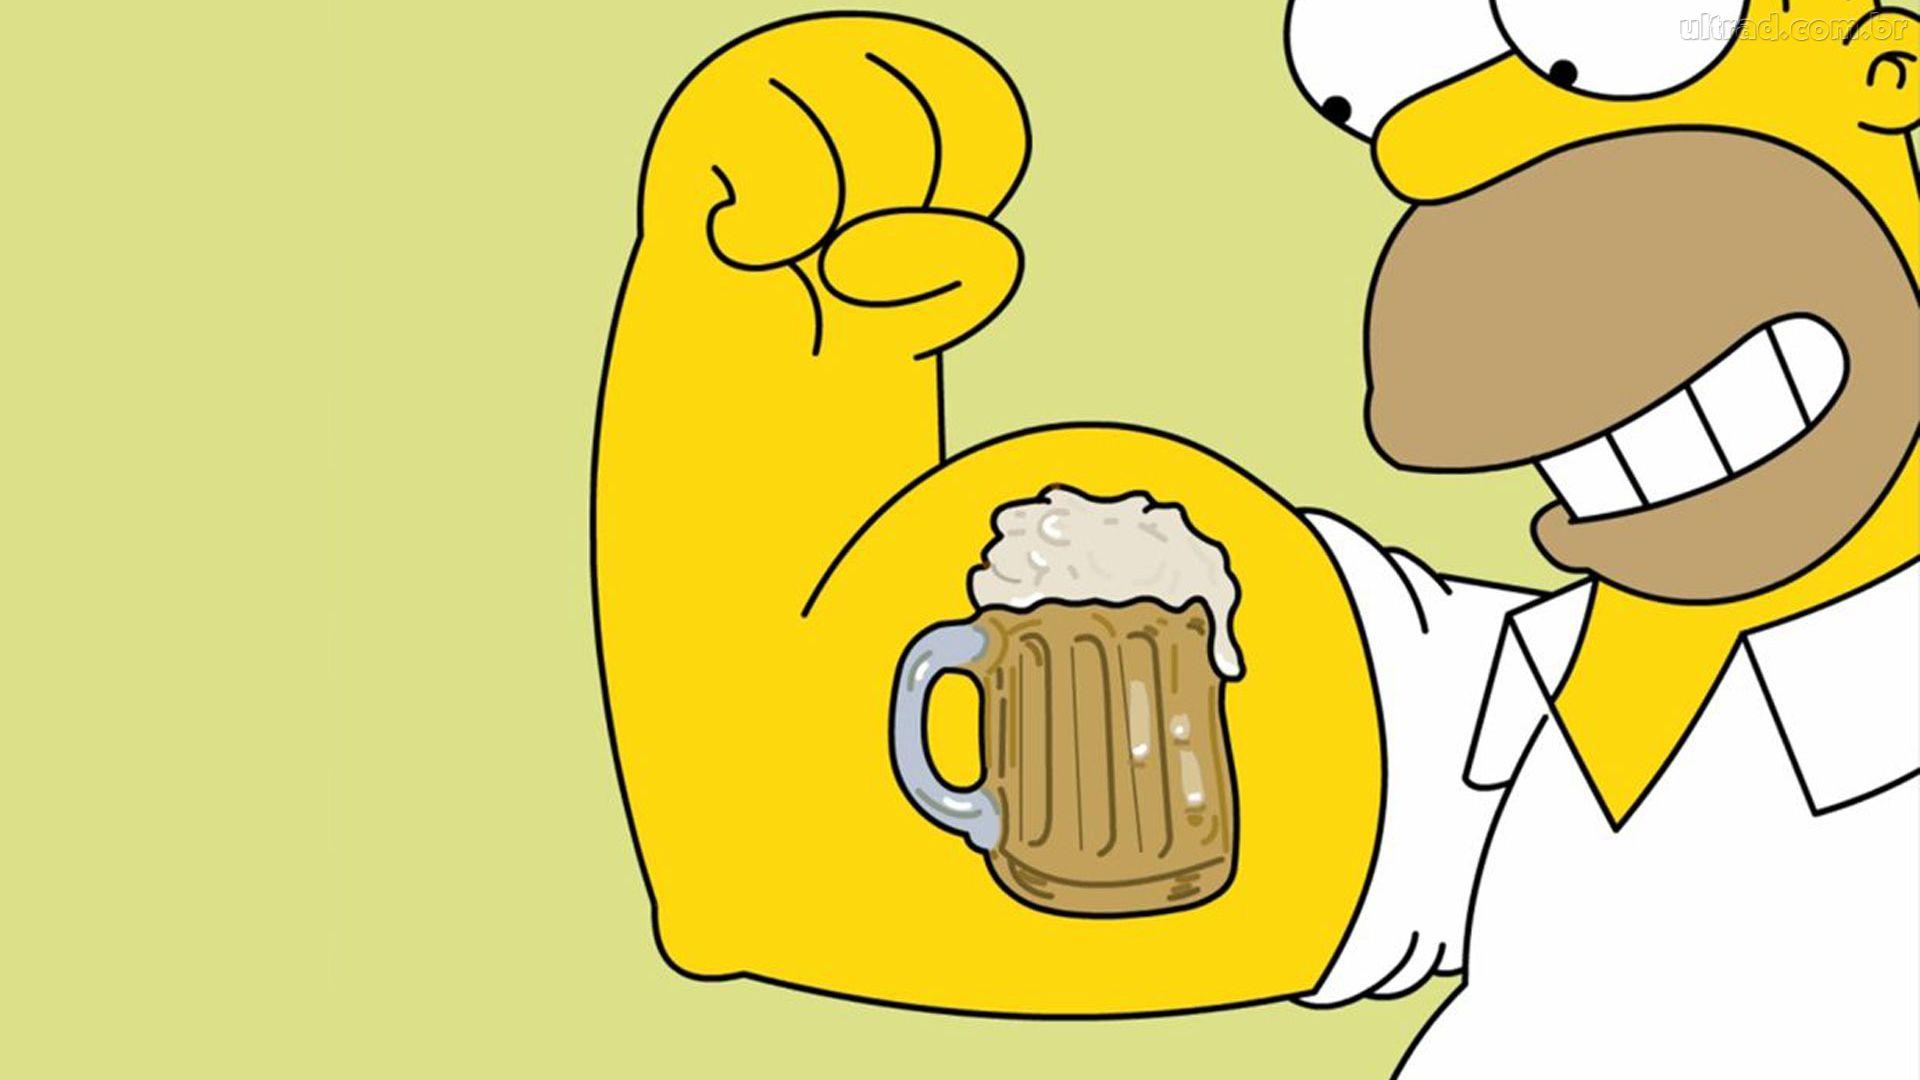 274810_Papel-de-Parede-Homer-Simpson-Musculo-de-Cerveja_1920x1080